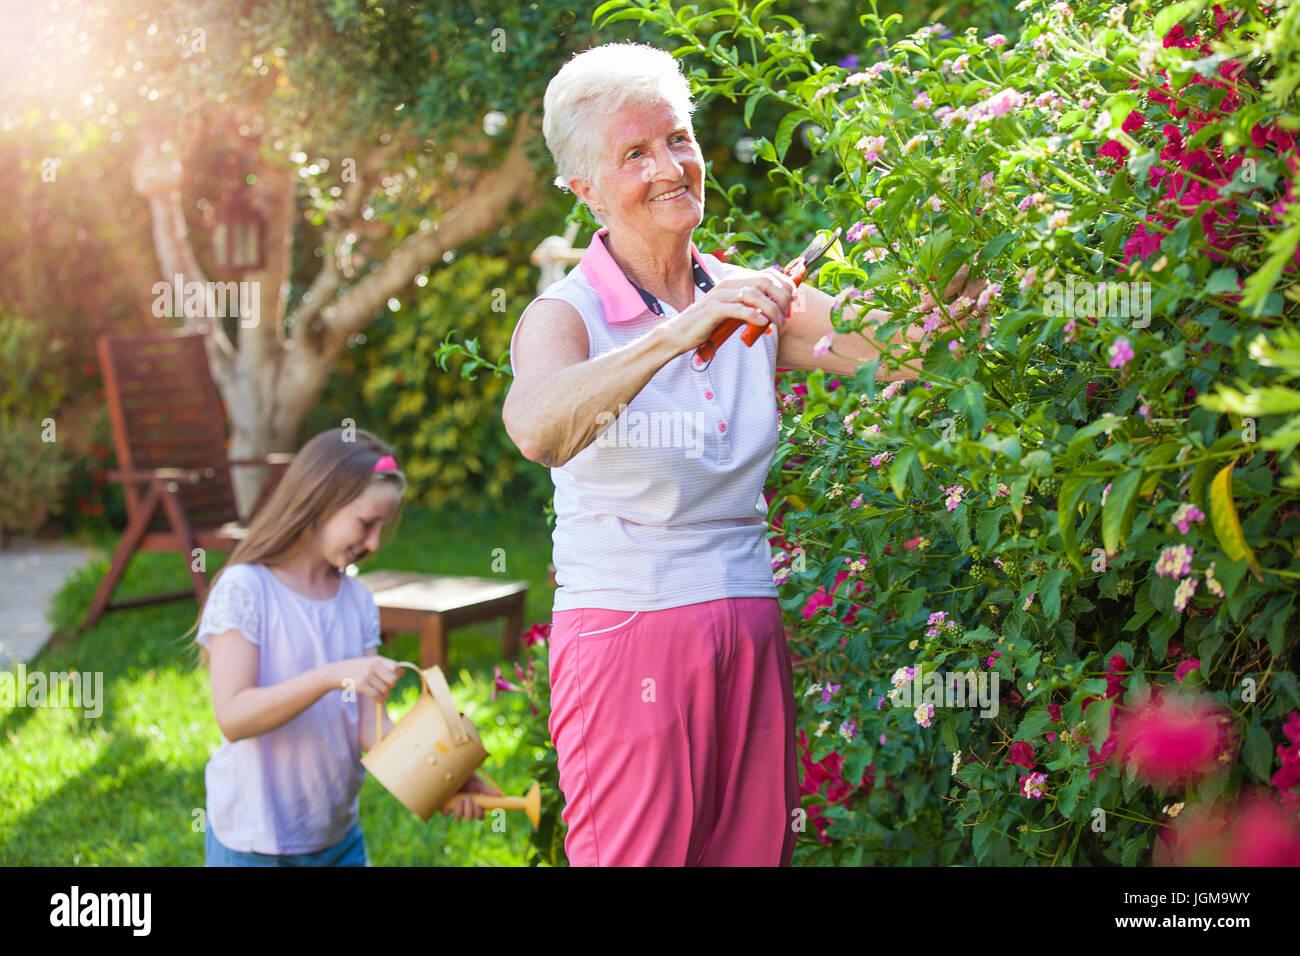 Family Gardening, Grandma With Grandchild Pruning And Watering.   Stock  Image